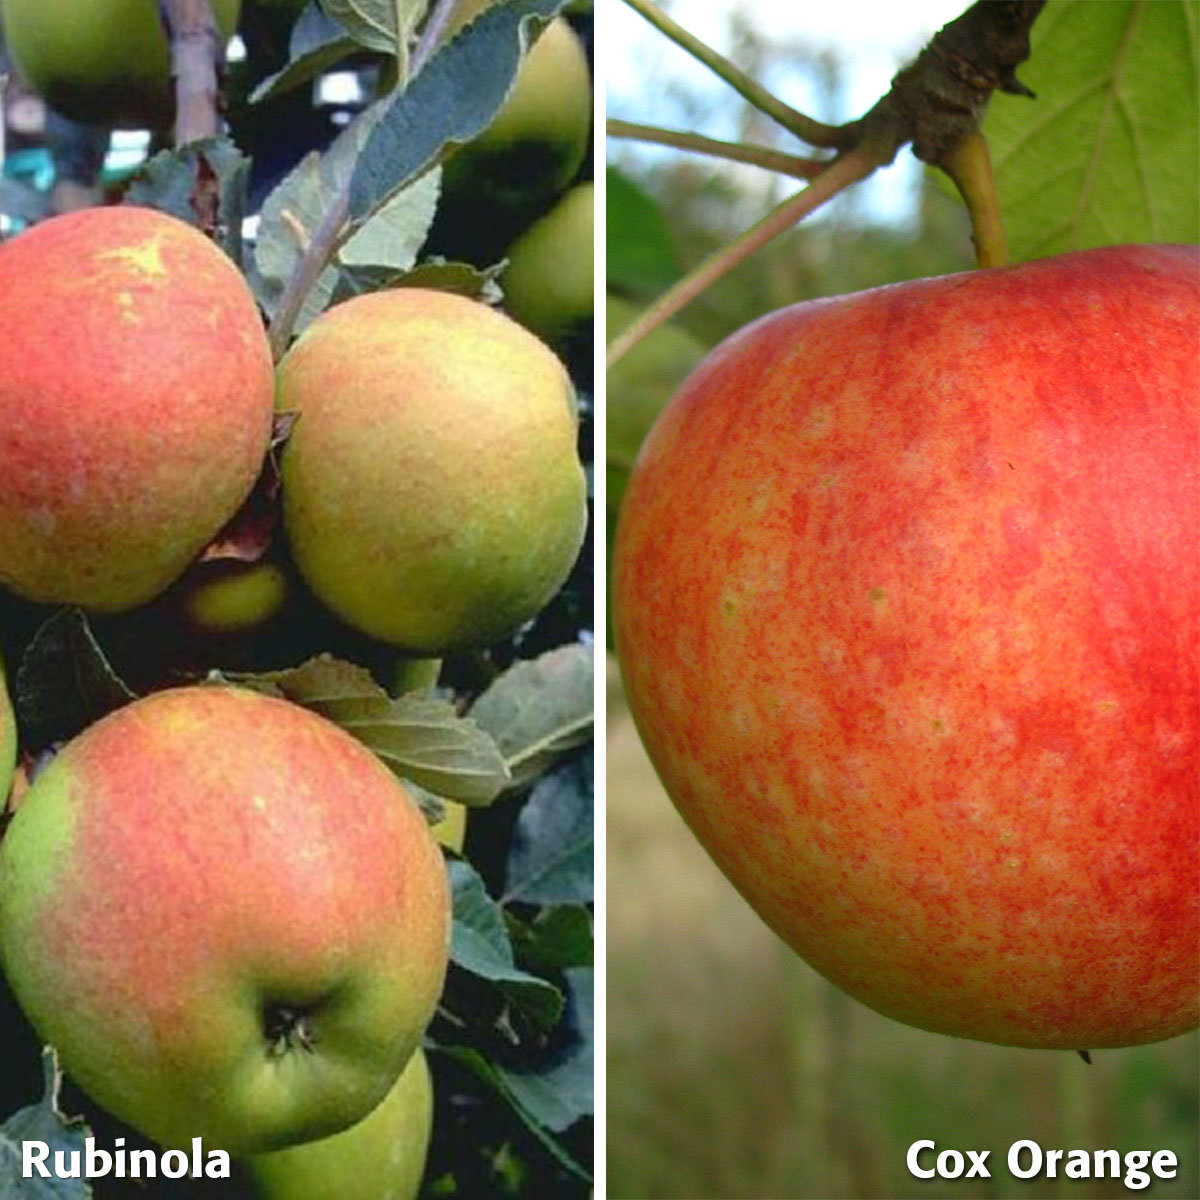 Duo-Apfel Rubinola - Cox Orange, 2-jährig